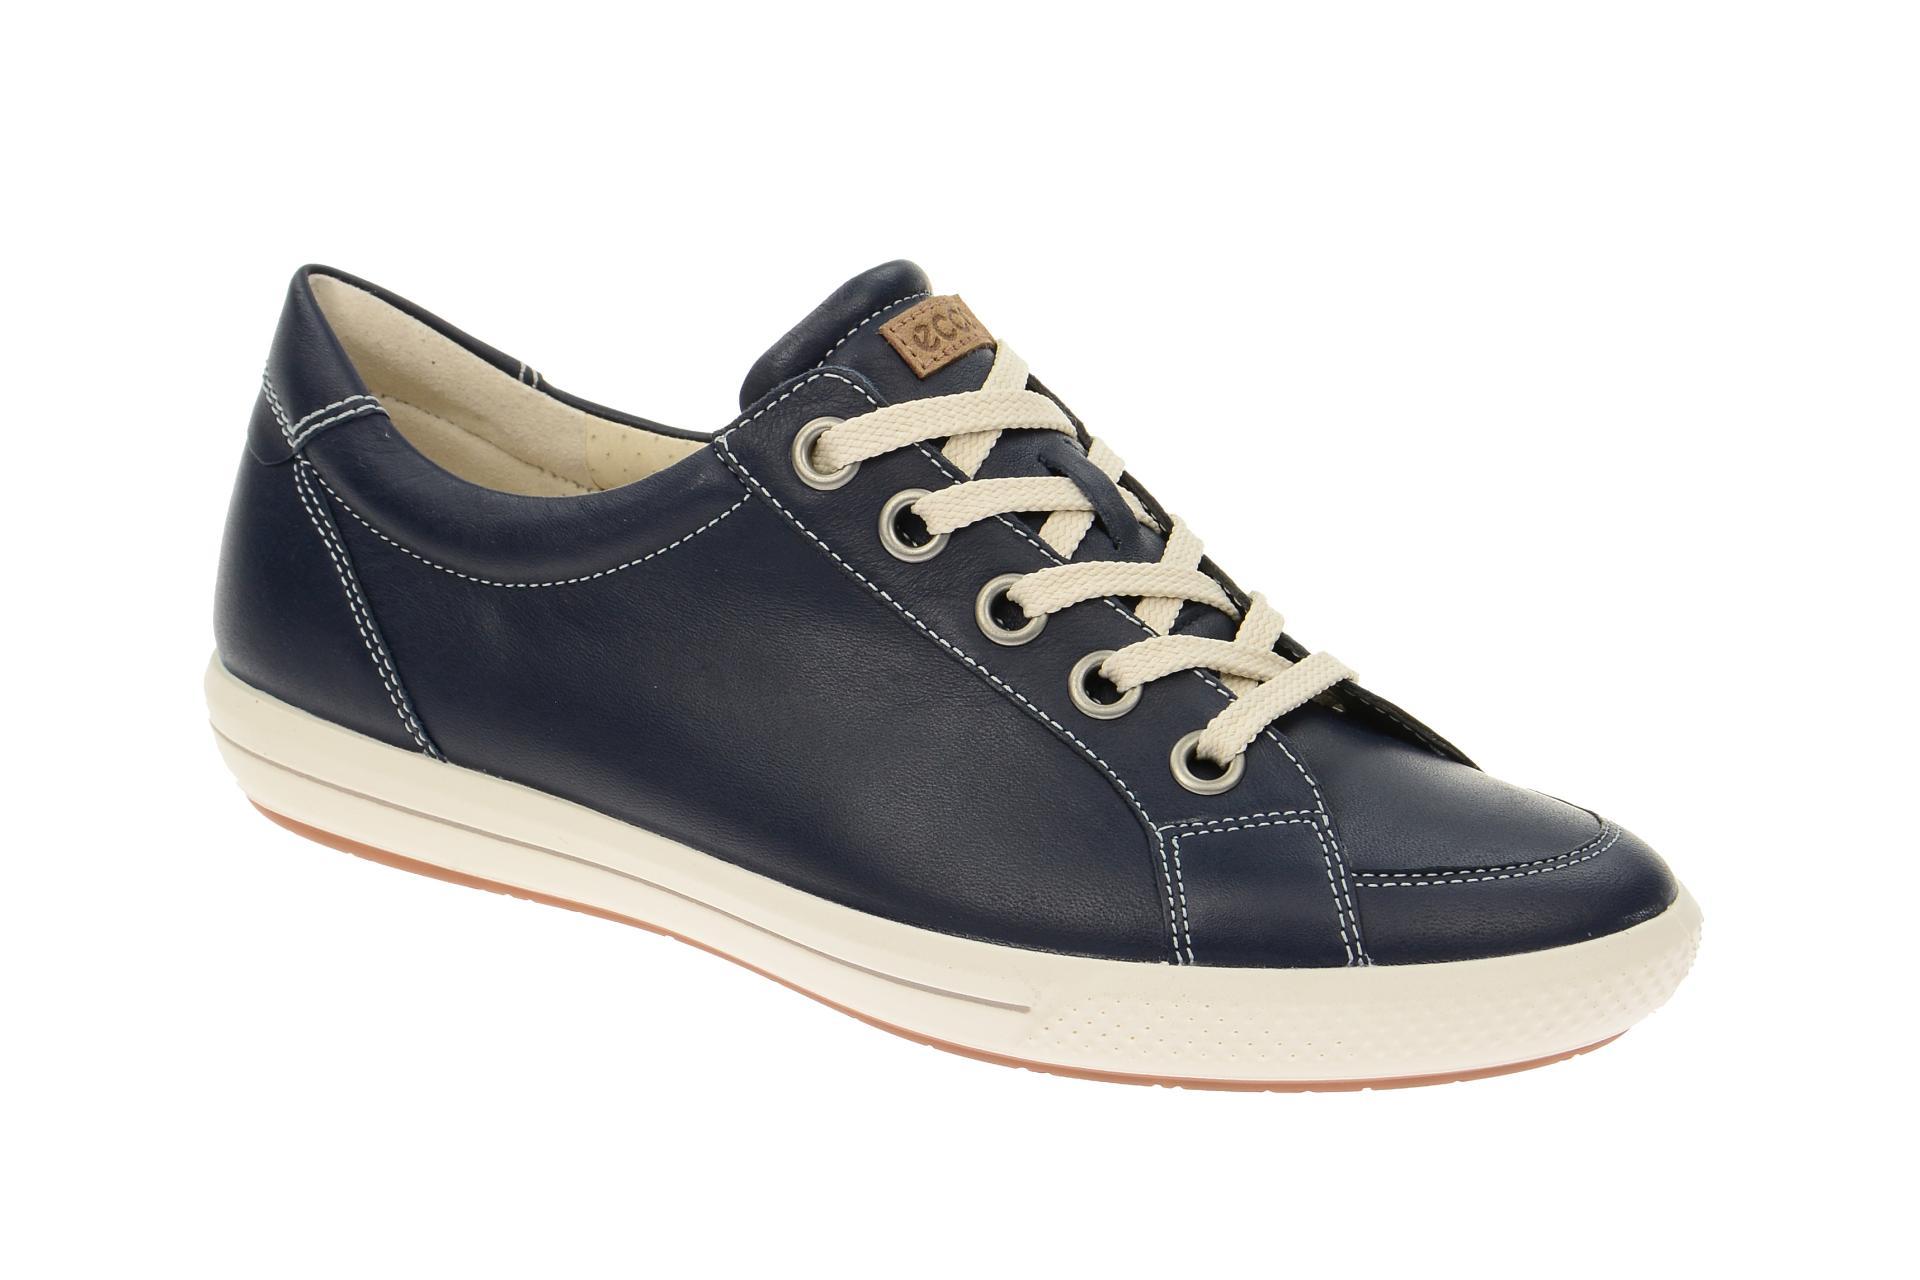 Ecco Summer Zone Schuhe blau marine 20004301038